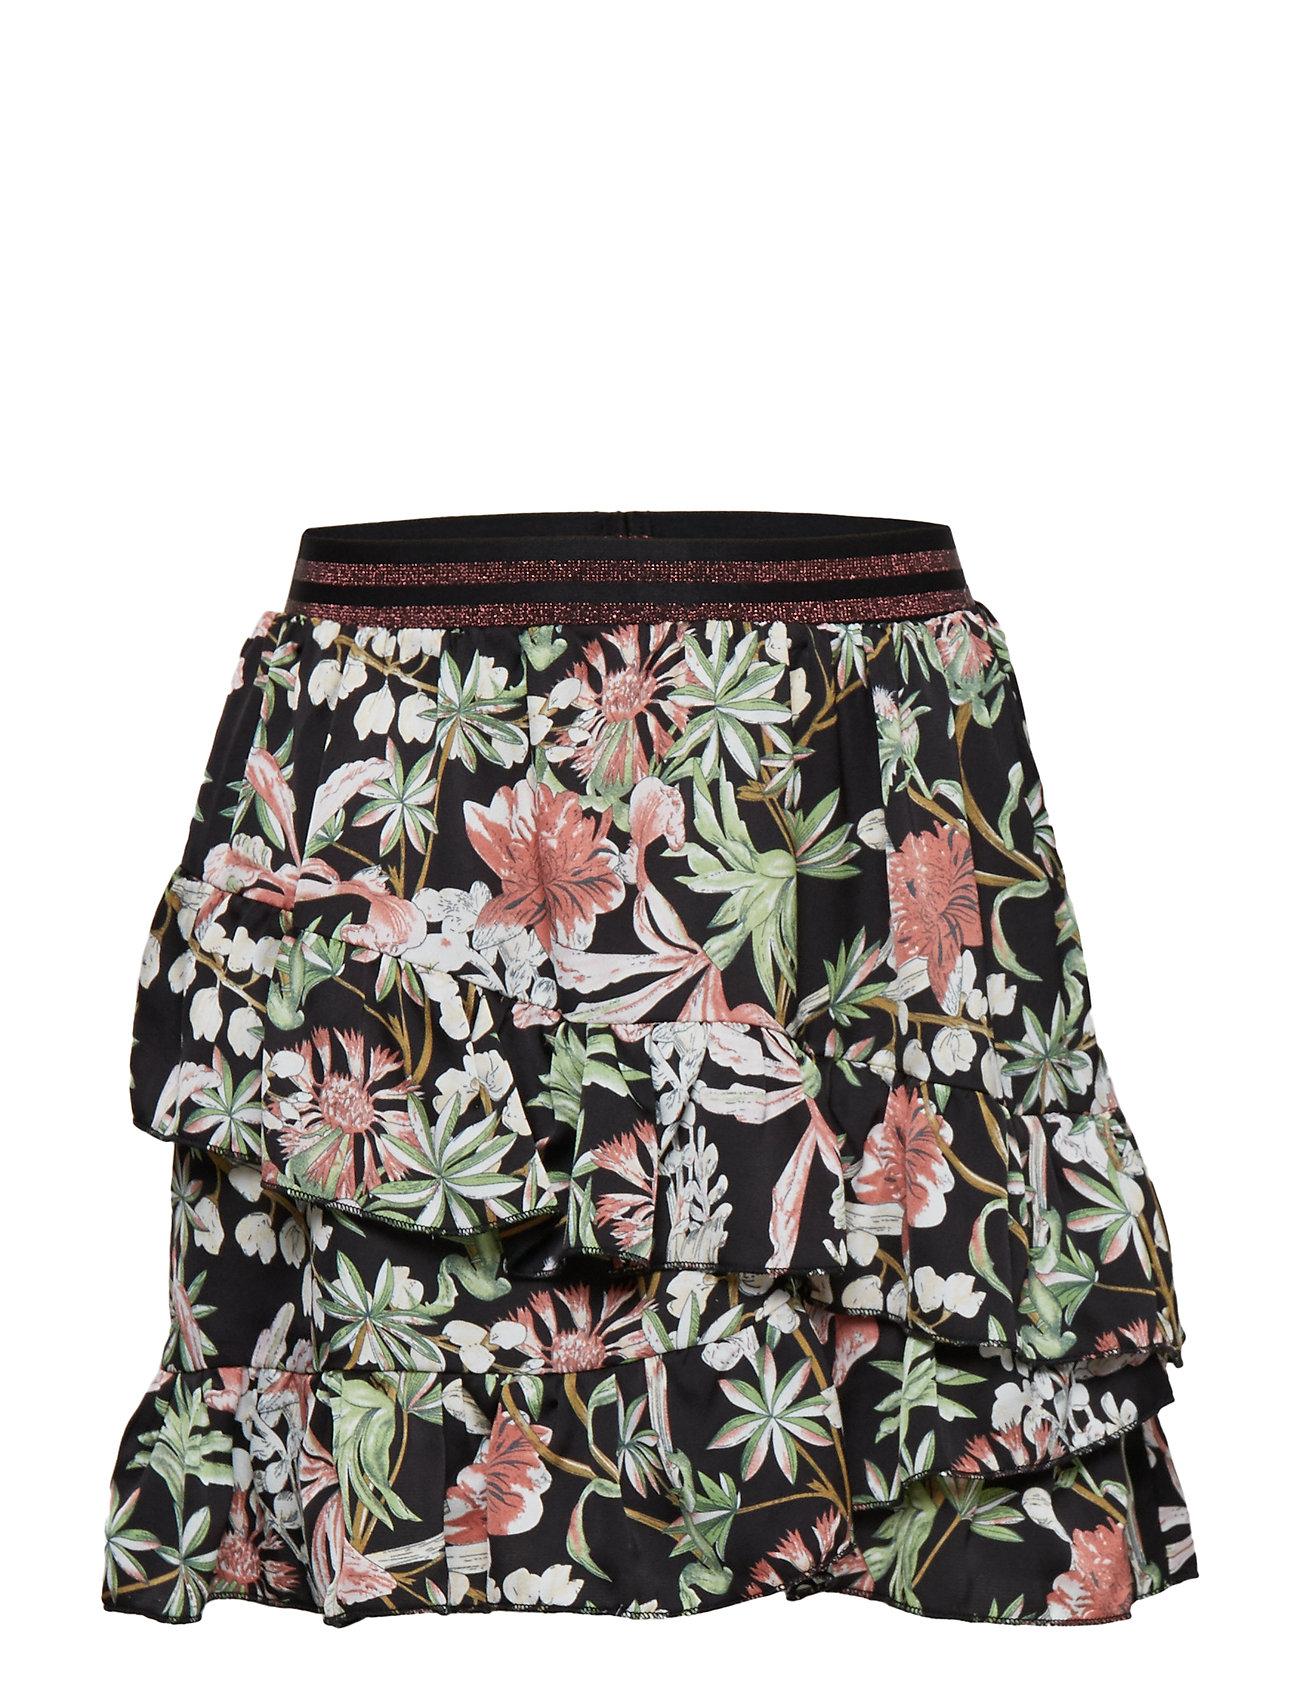 d2397cf960d Skirt (Aop Black Print) (£27) - Petit by Sofie Schnoor - | Boozt.com